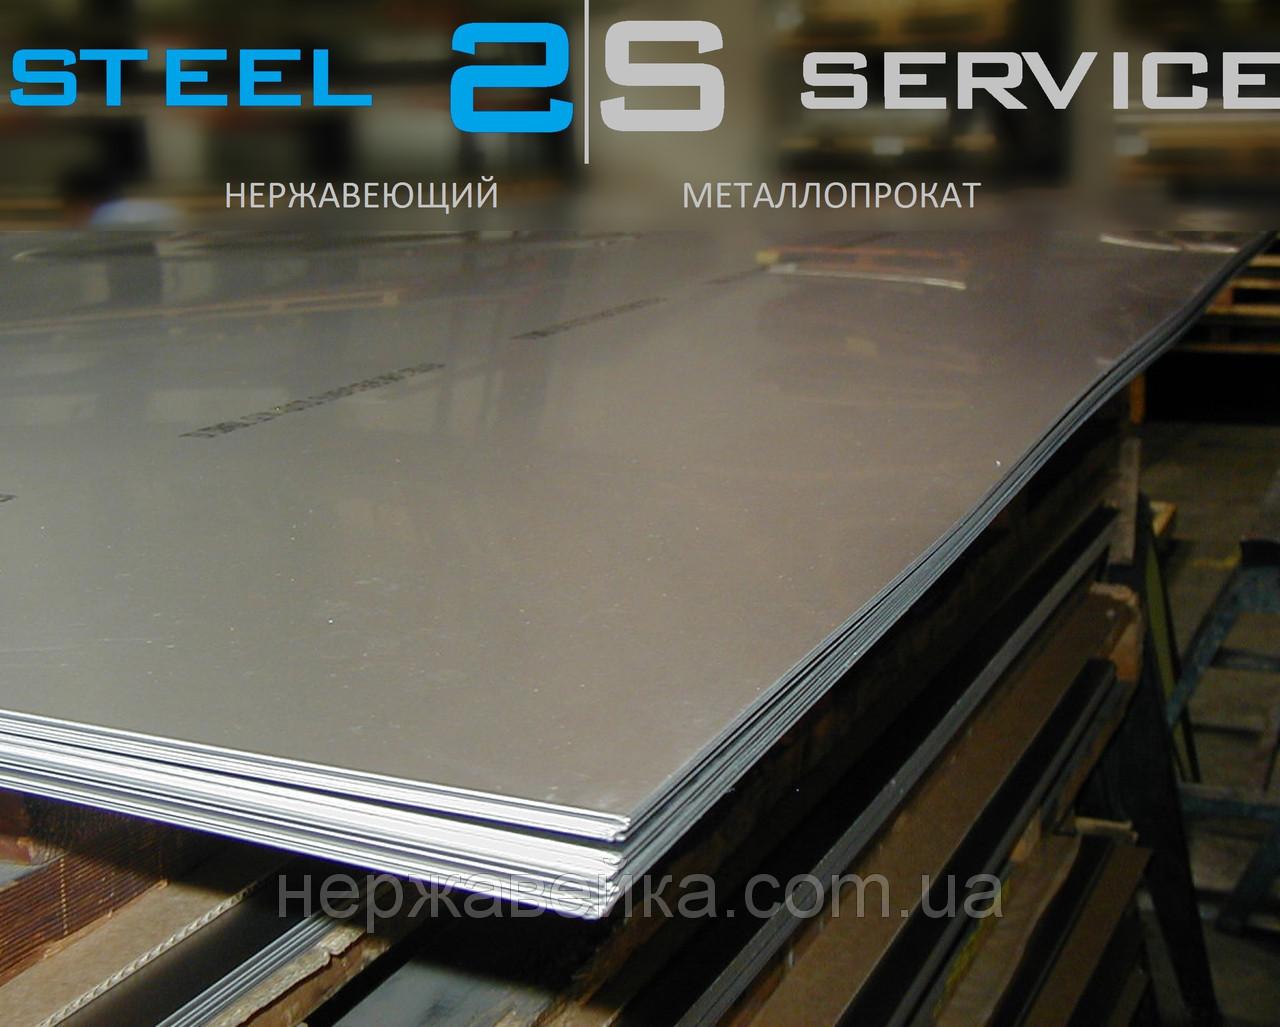 Листовая нержавейка 10х1000х2000мм  AISI 316Ti(10Х17Н13М2Т) F1 - горячекатанный,  кислотостойкий